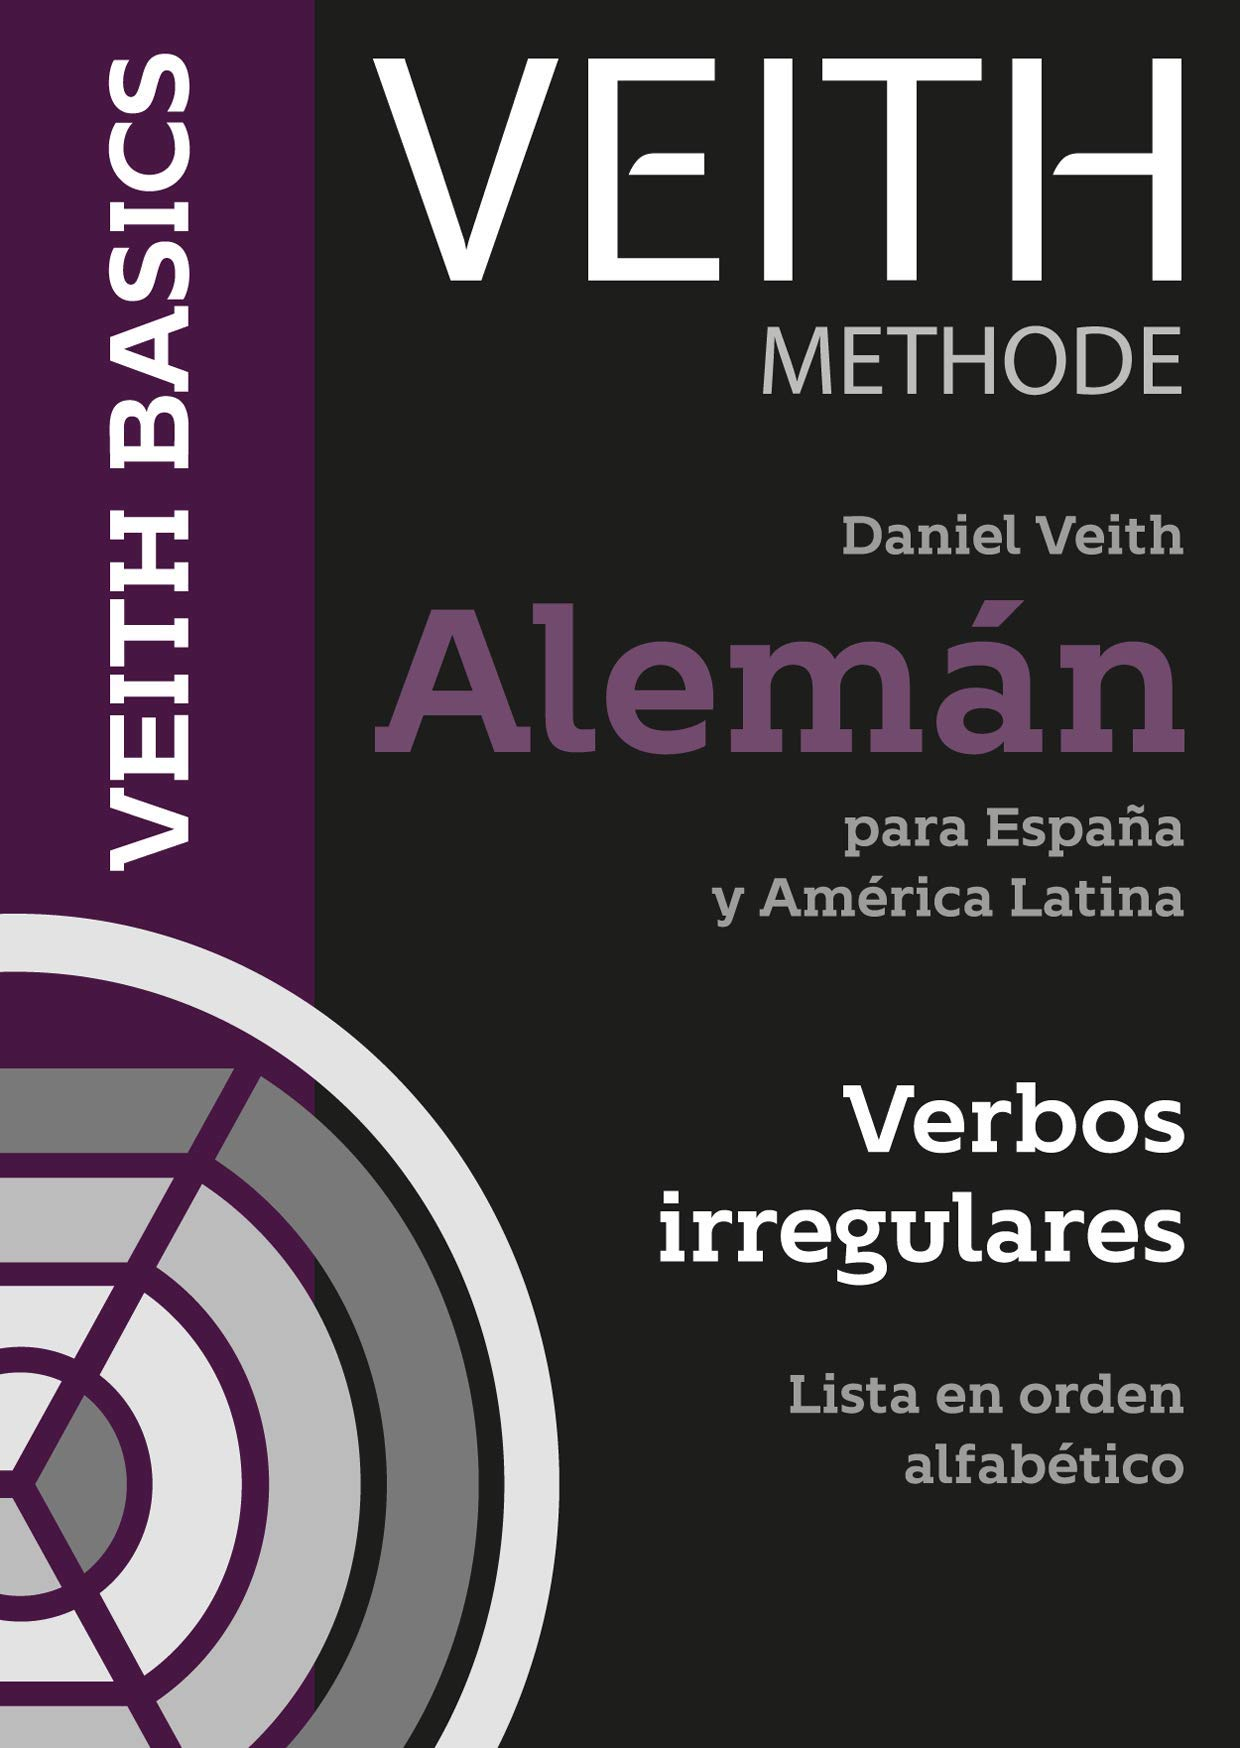 VEITH Methode. Alemán para España y América Latina. Verbos ...